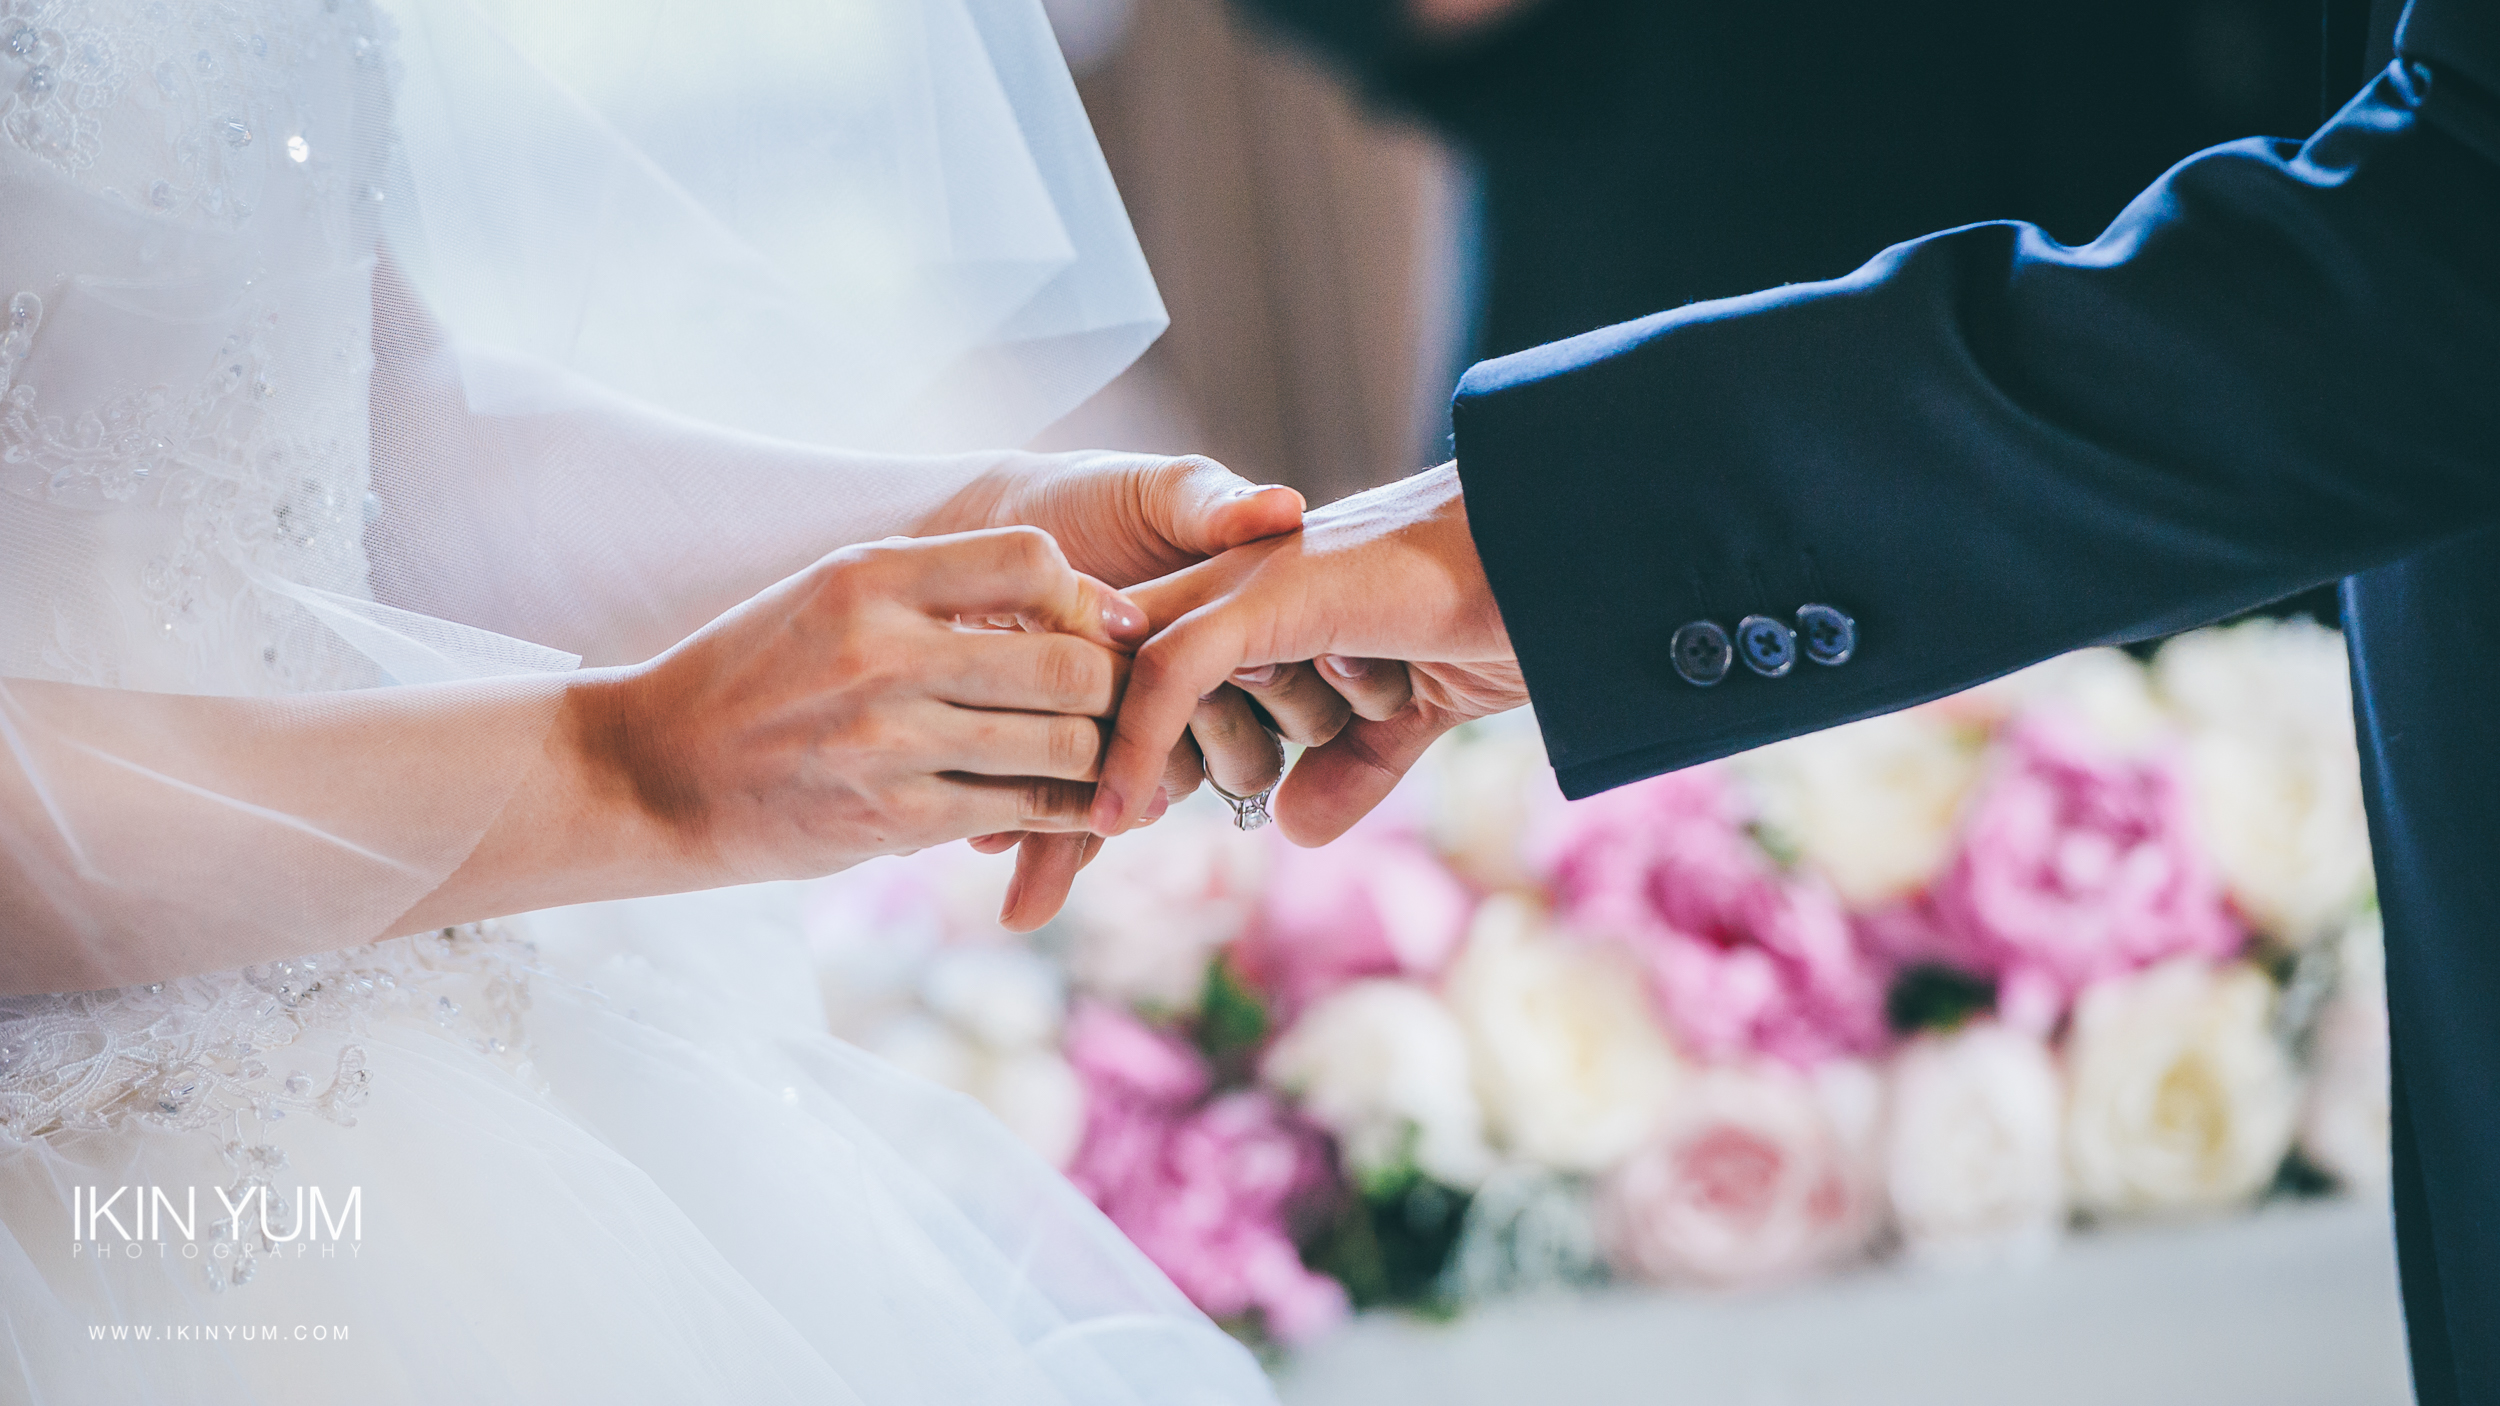 St Pancras Renaissance Hotel - Wedding - Ikin Yum Photography-092.jpg